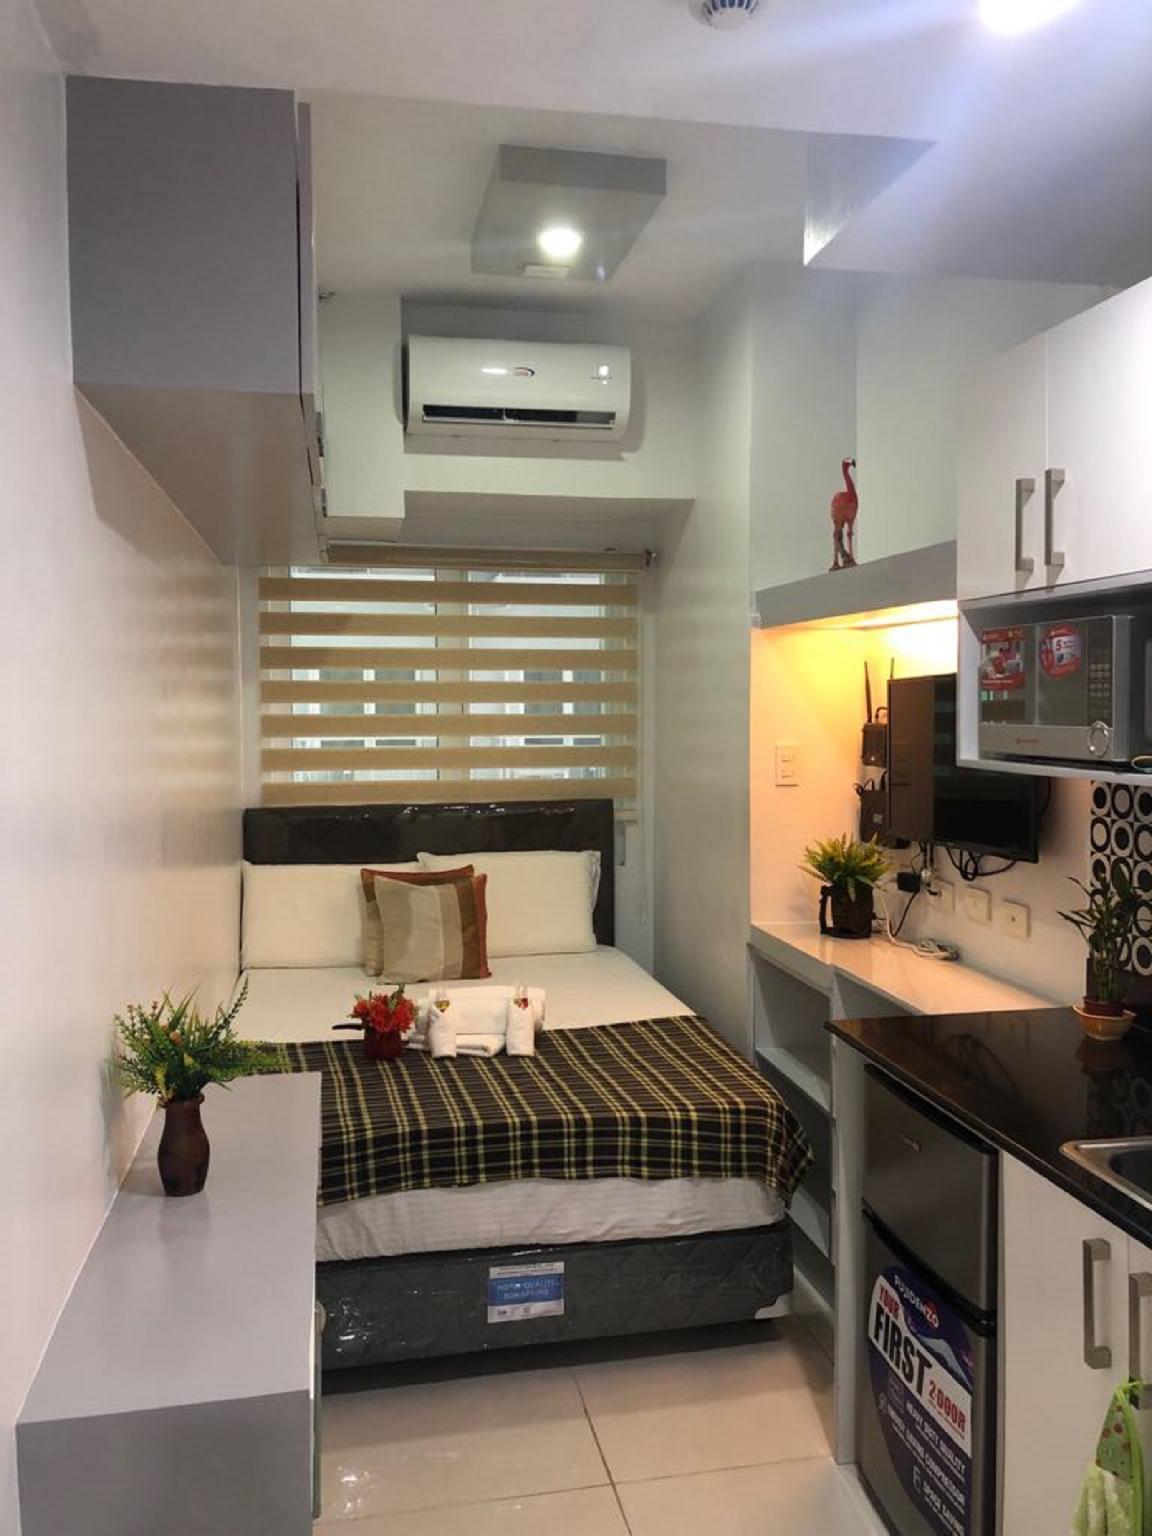 Affordable HoteLike Studio Unit in  Metro Manila